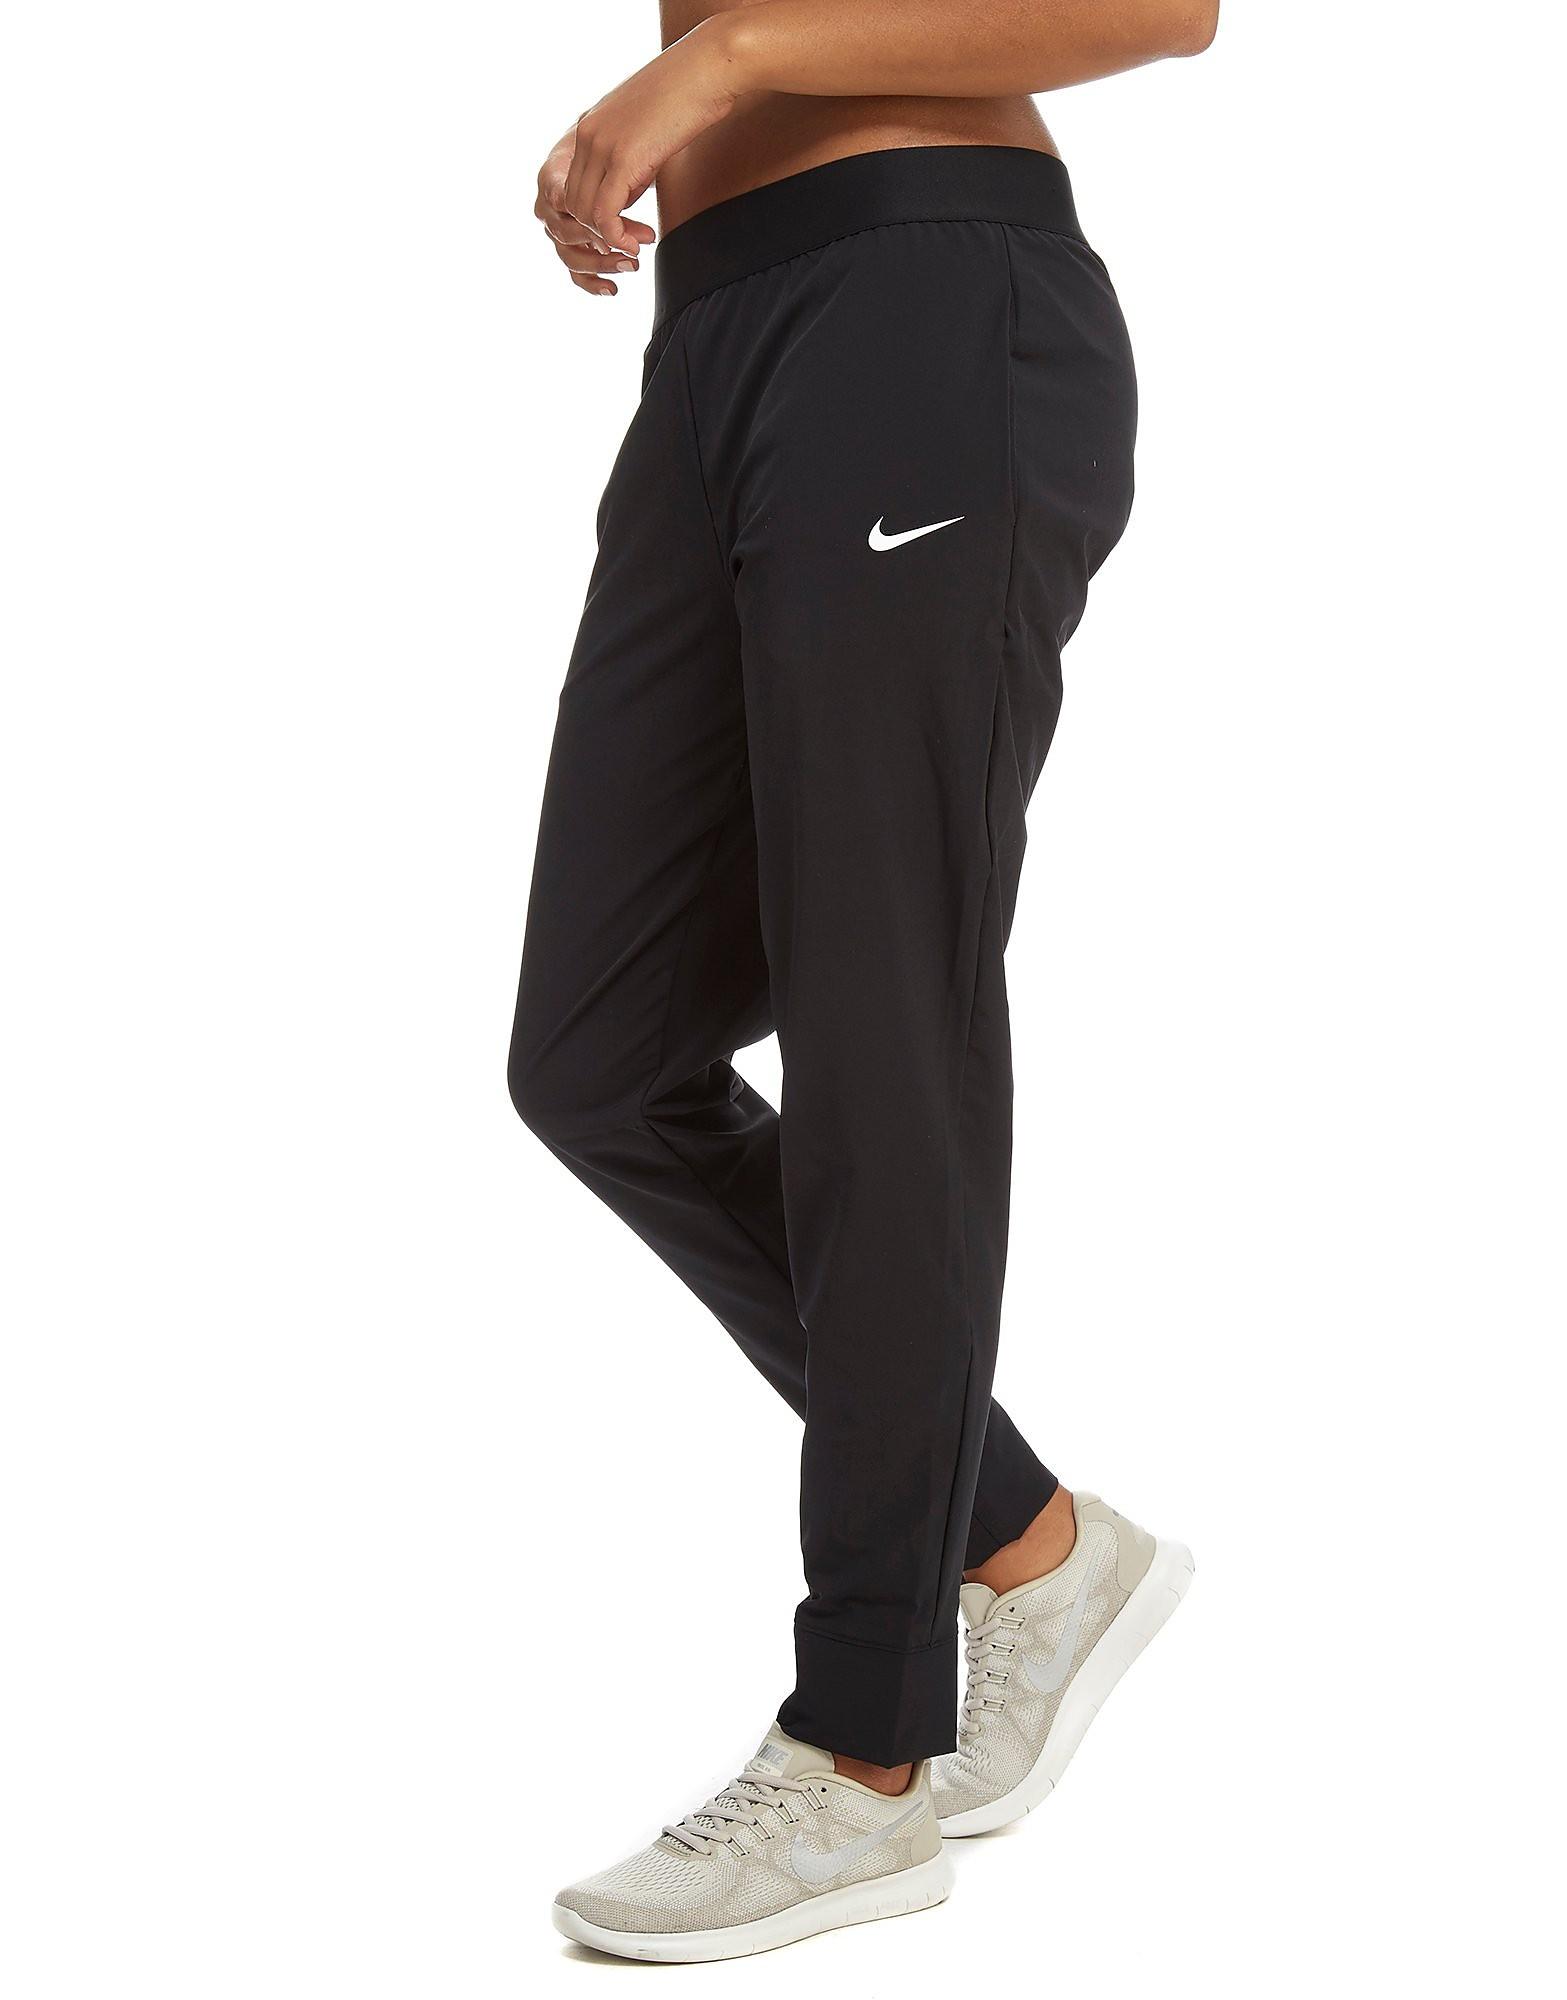 Nike Bliss Studio Pants